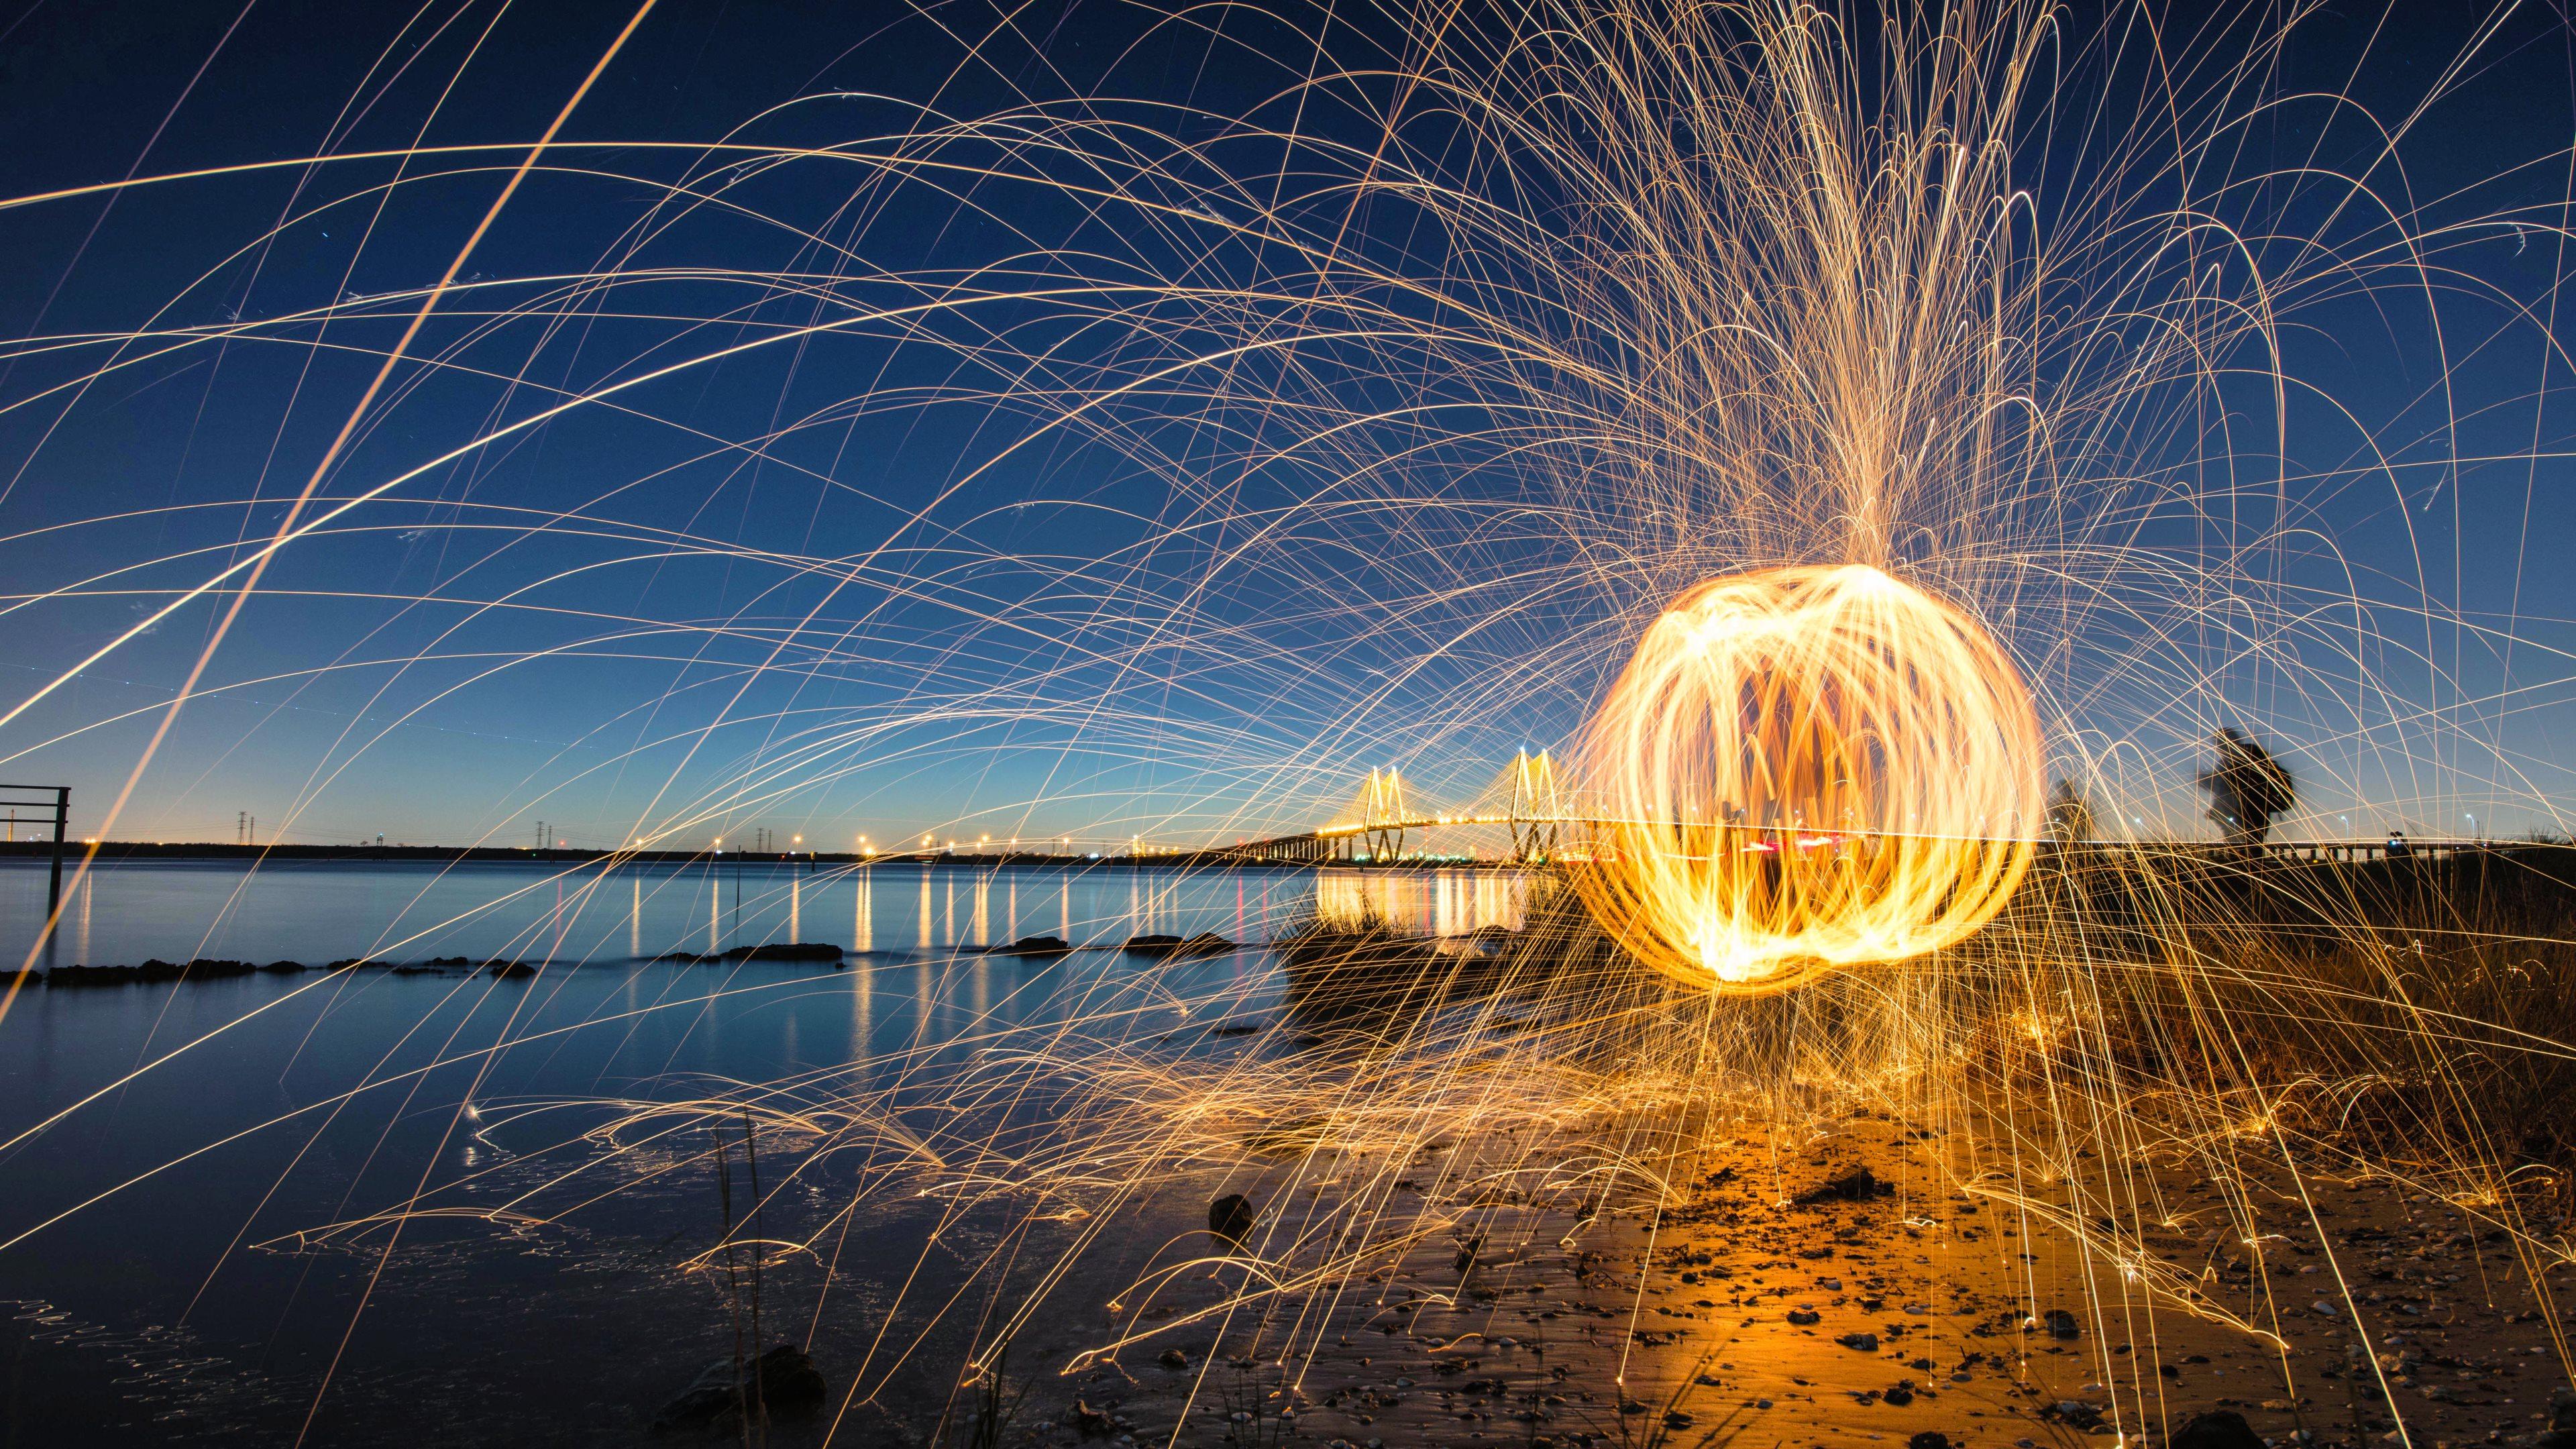 4k Hd Wallapaper: Fireworks 4k Ultra HD Wallpaper